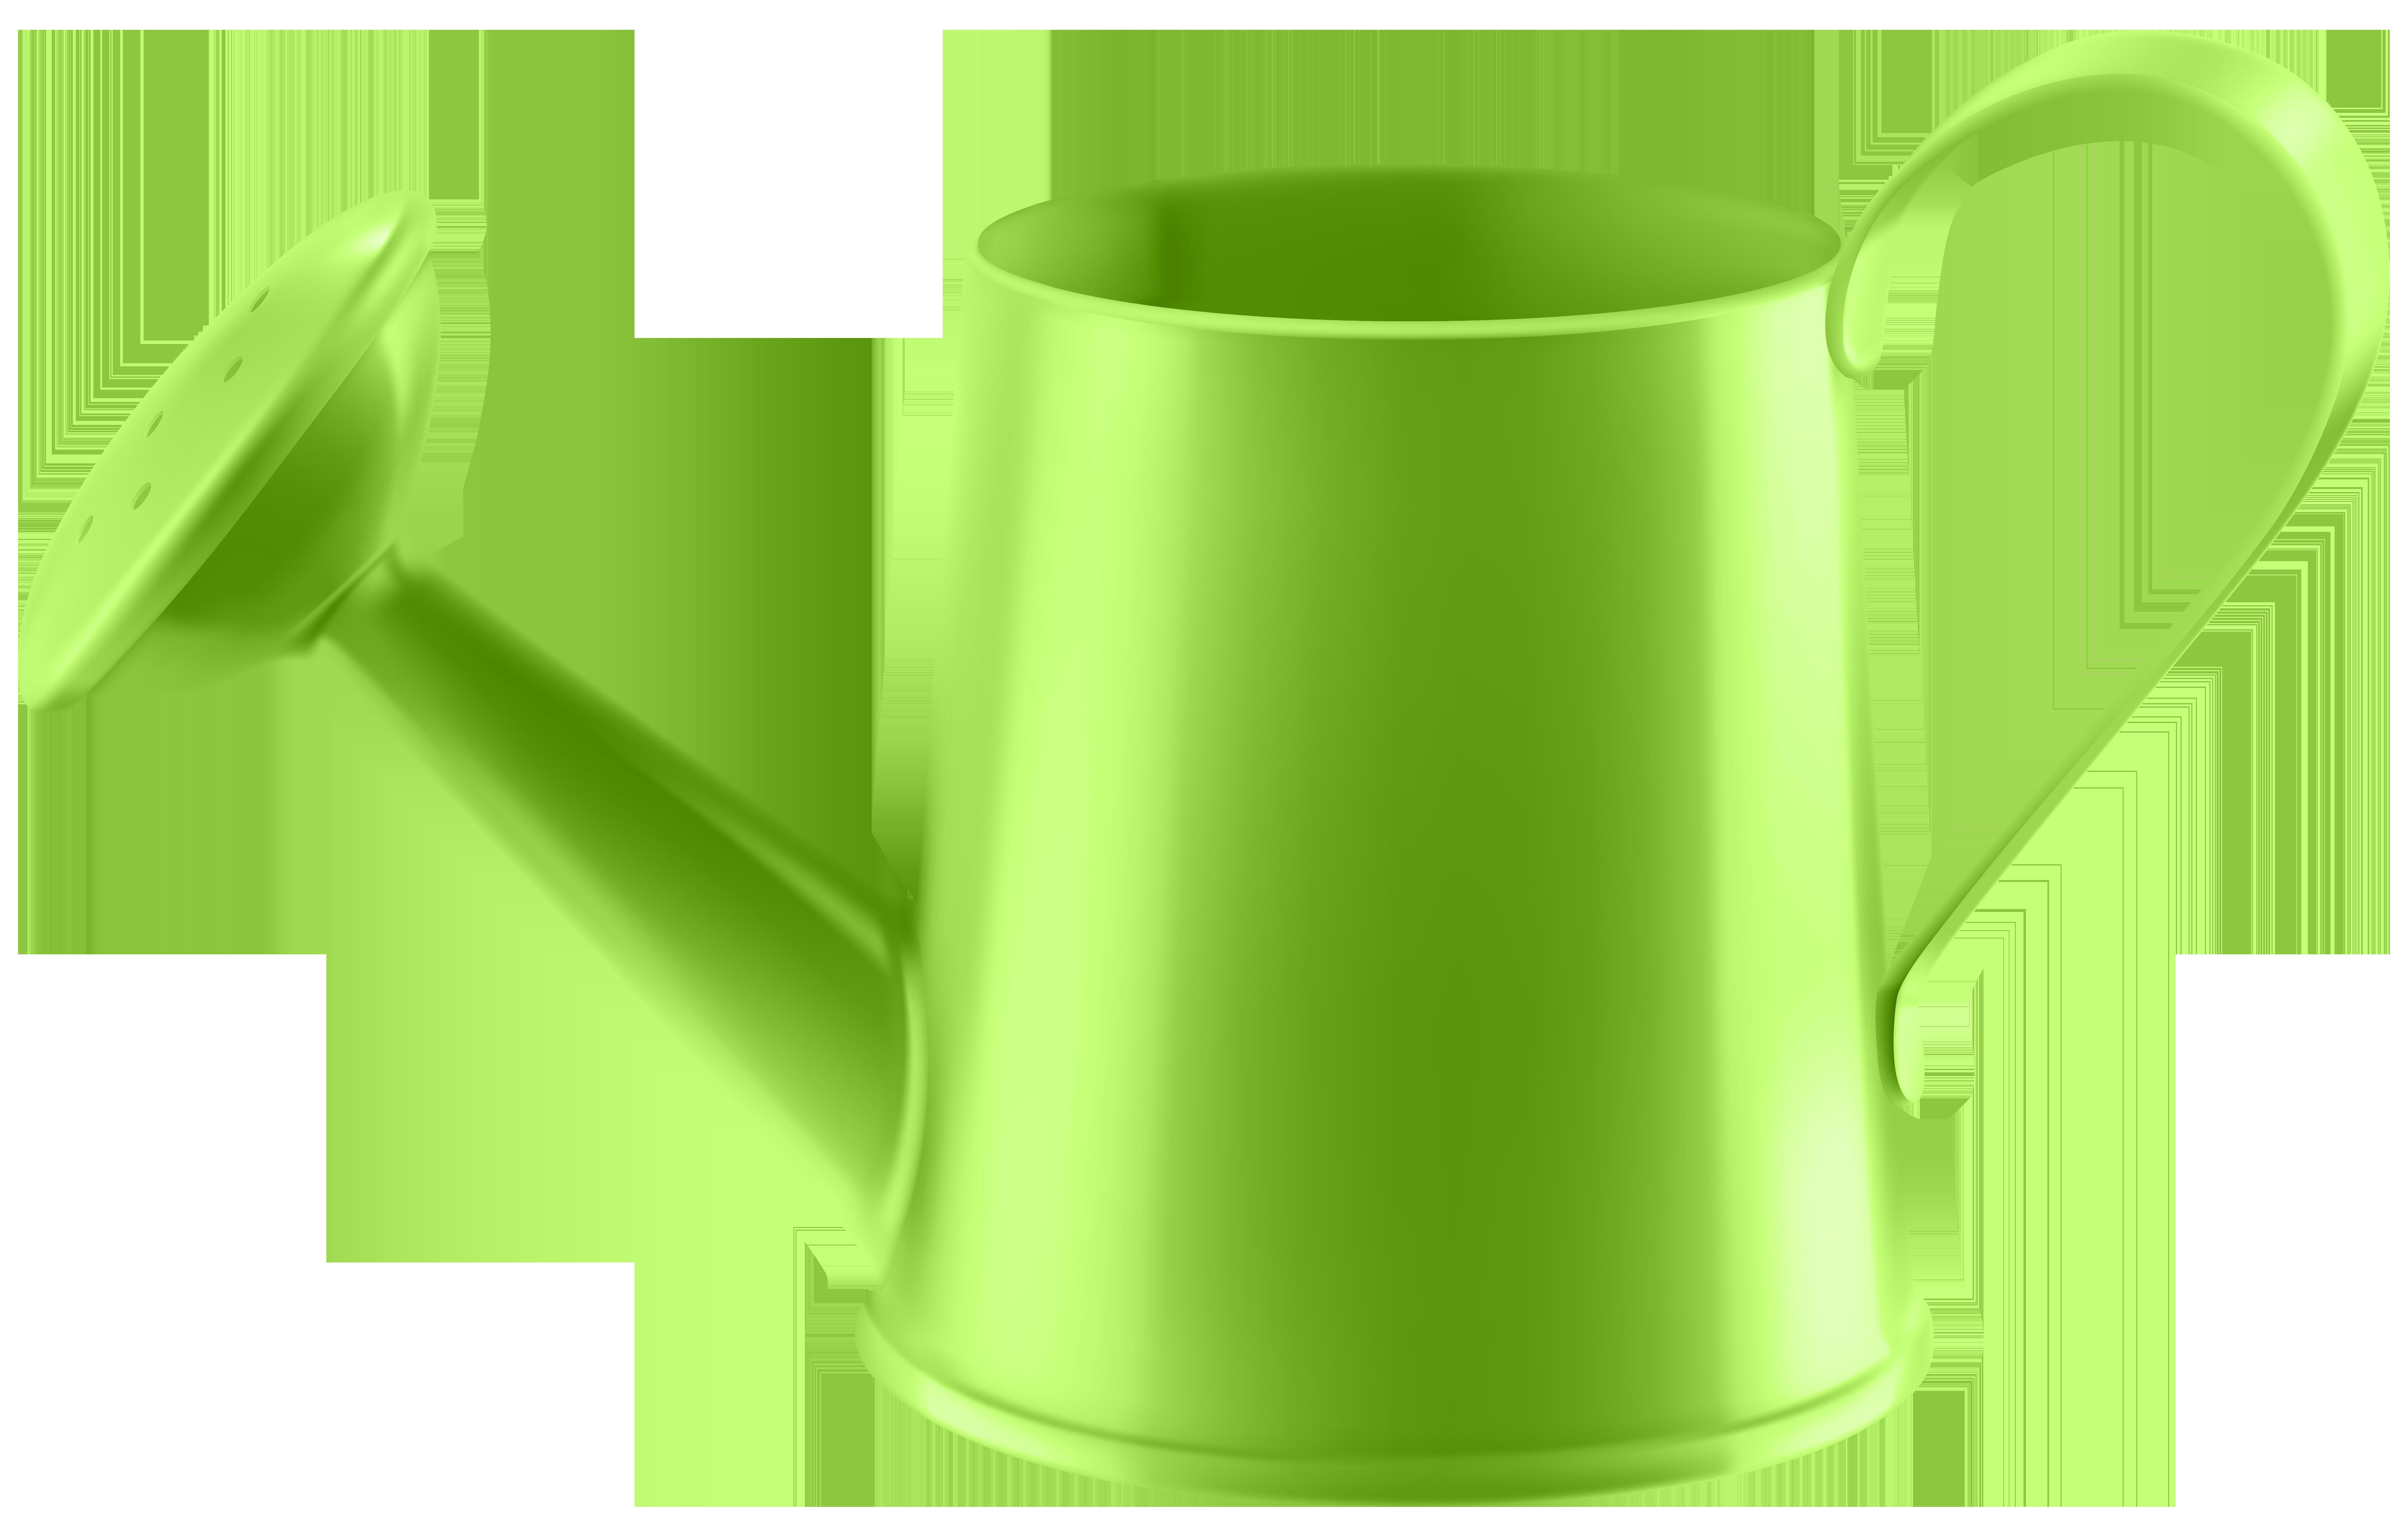 Mug clipart water. Green can transparent png